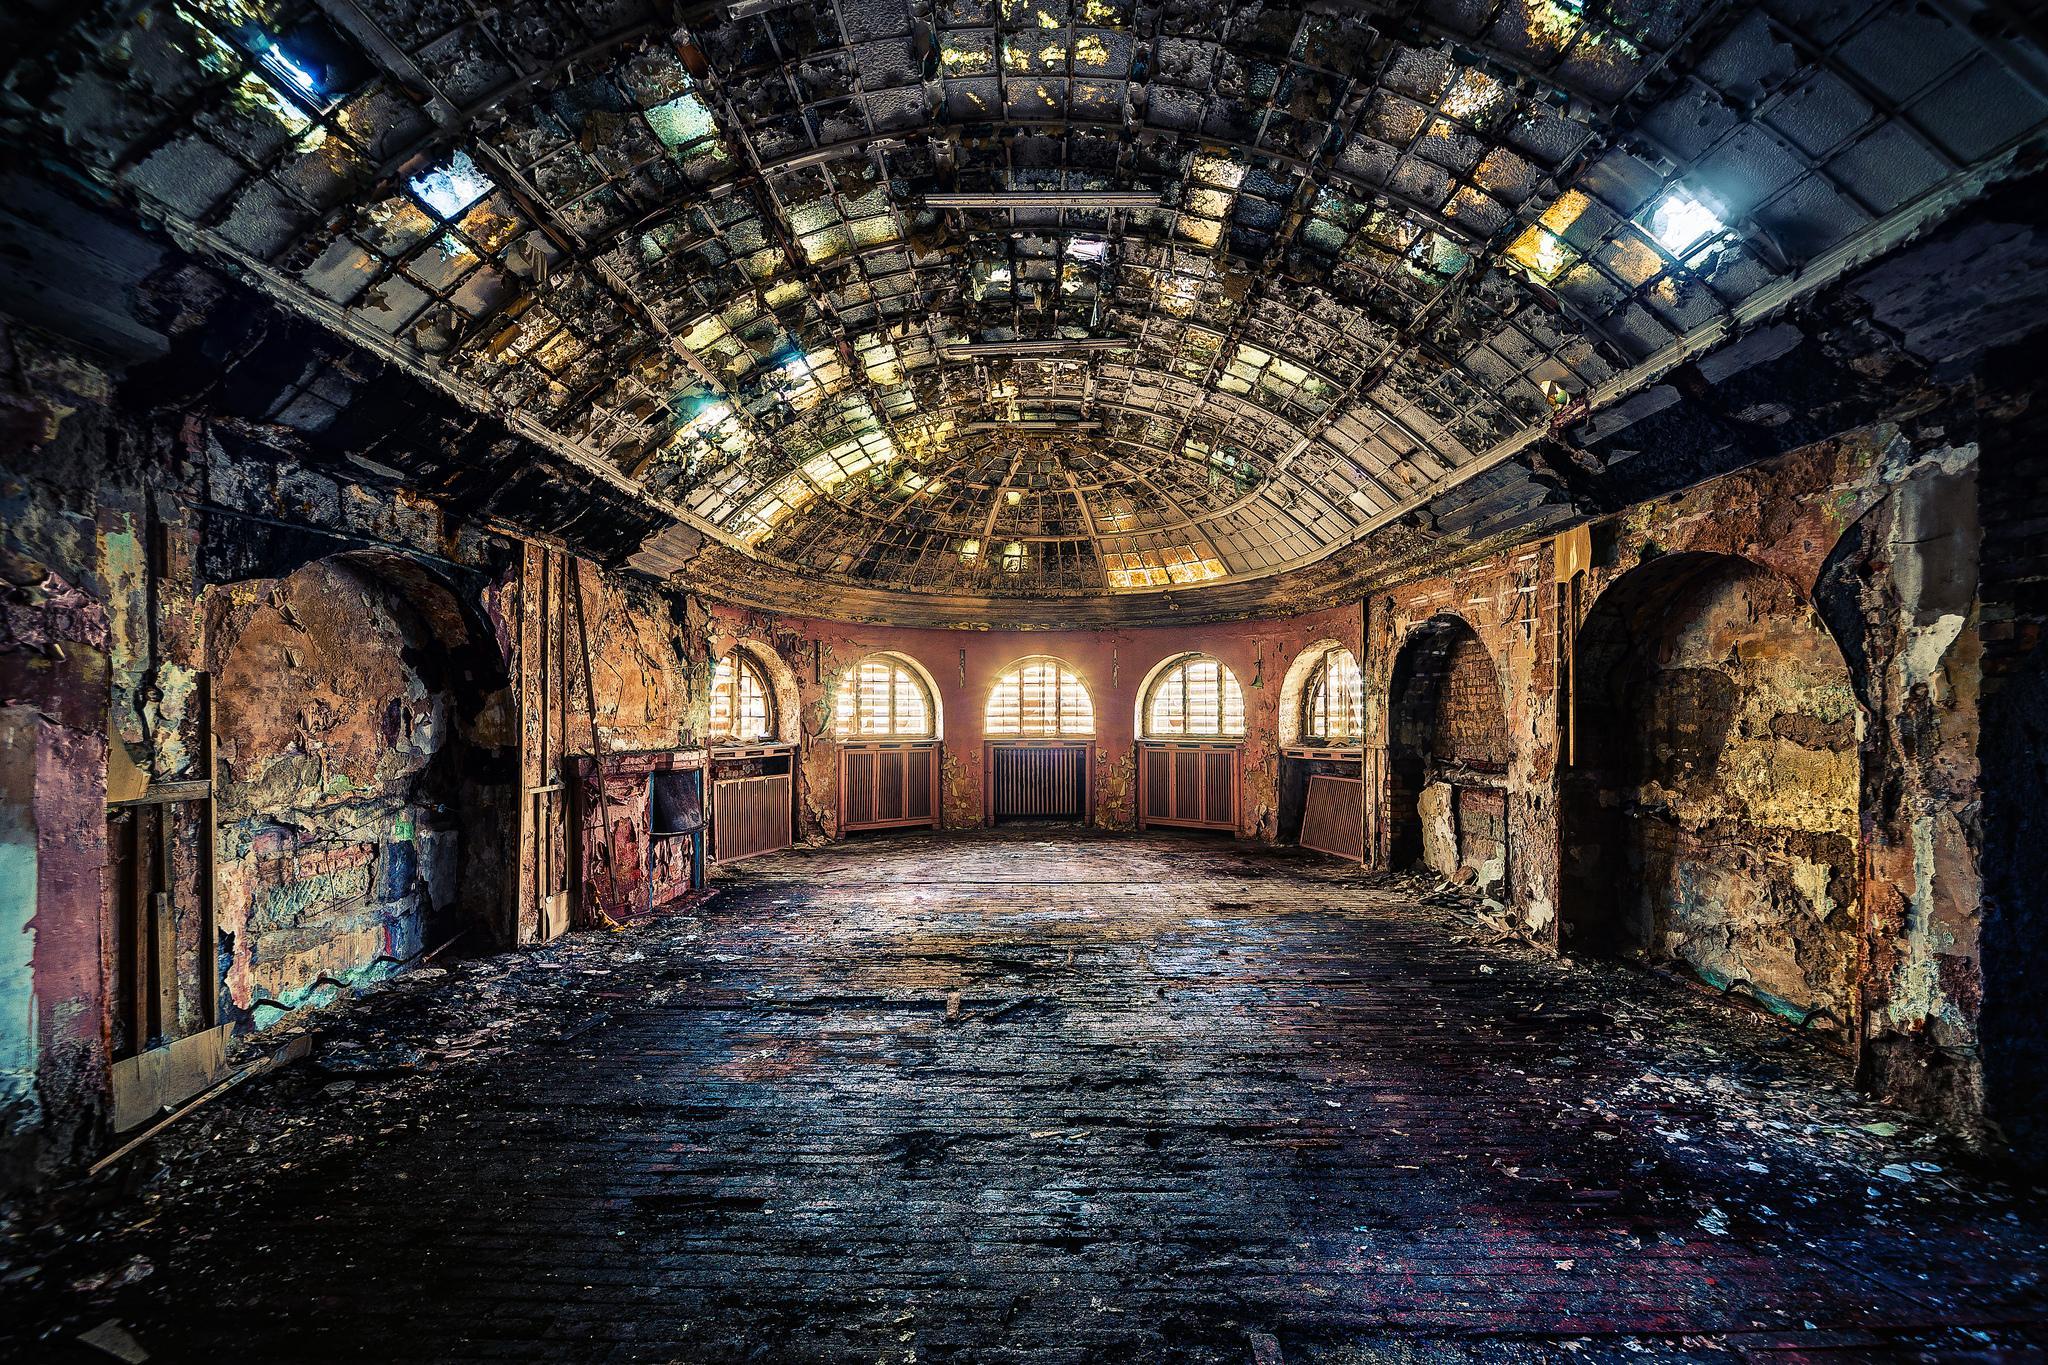 обои интерьер, комната, зал, руины картинки фото